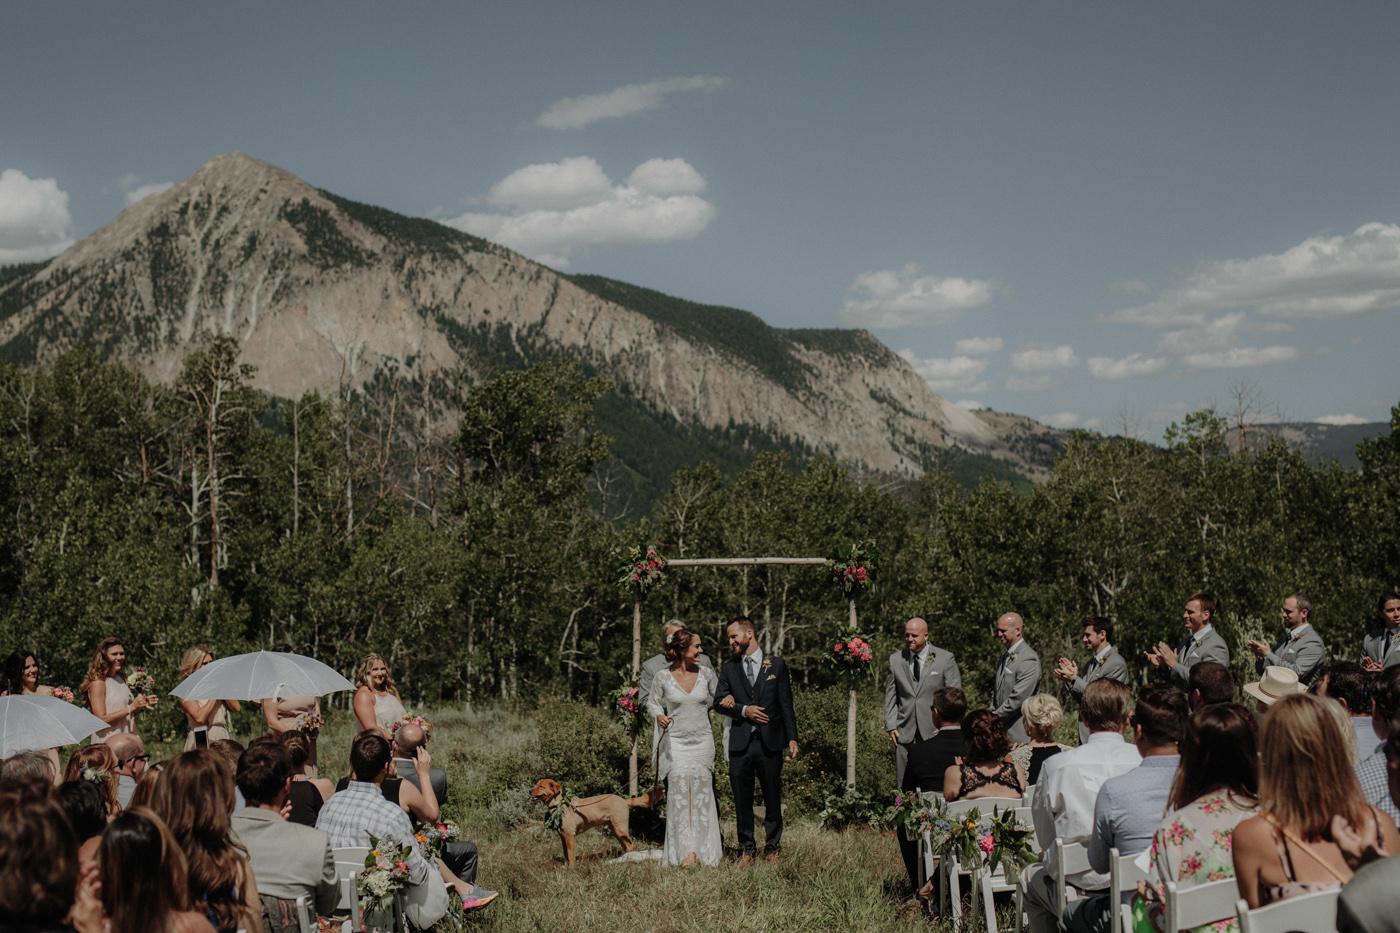 woods-walk-trail-crested-butte-colorado-wedding-55.jpg